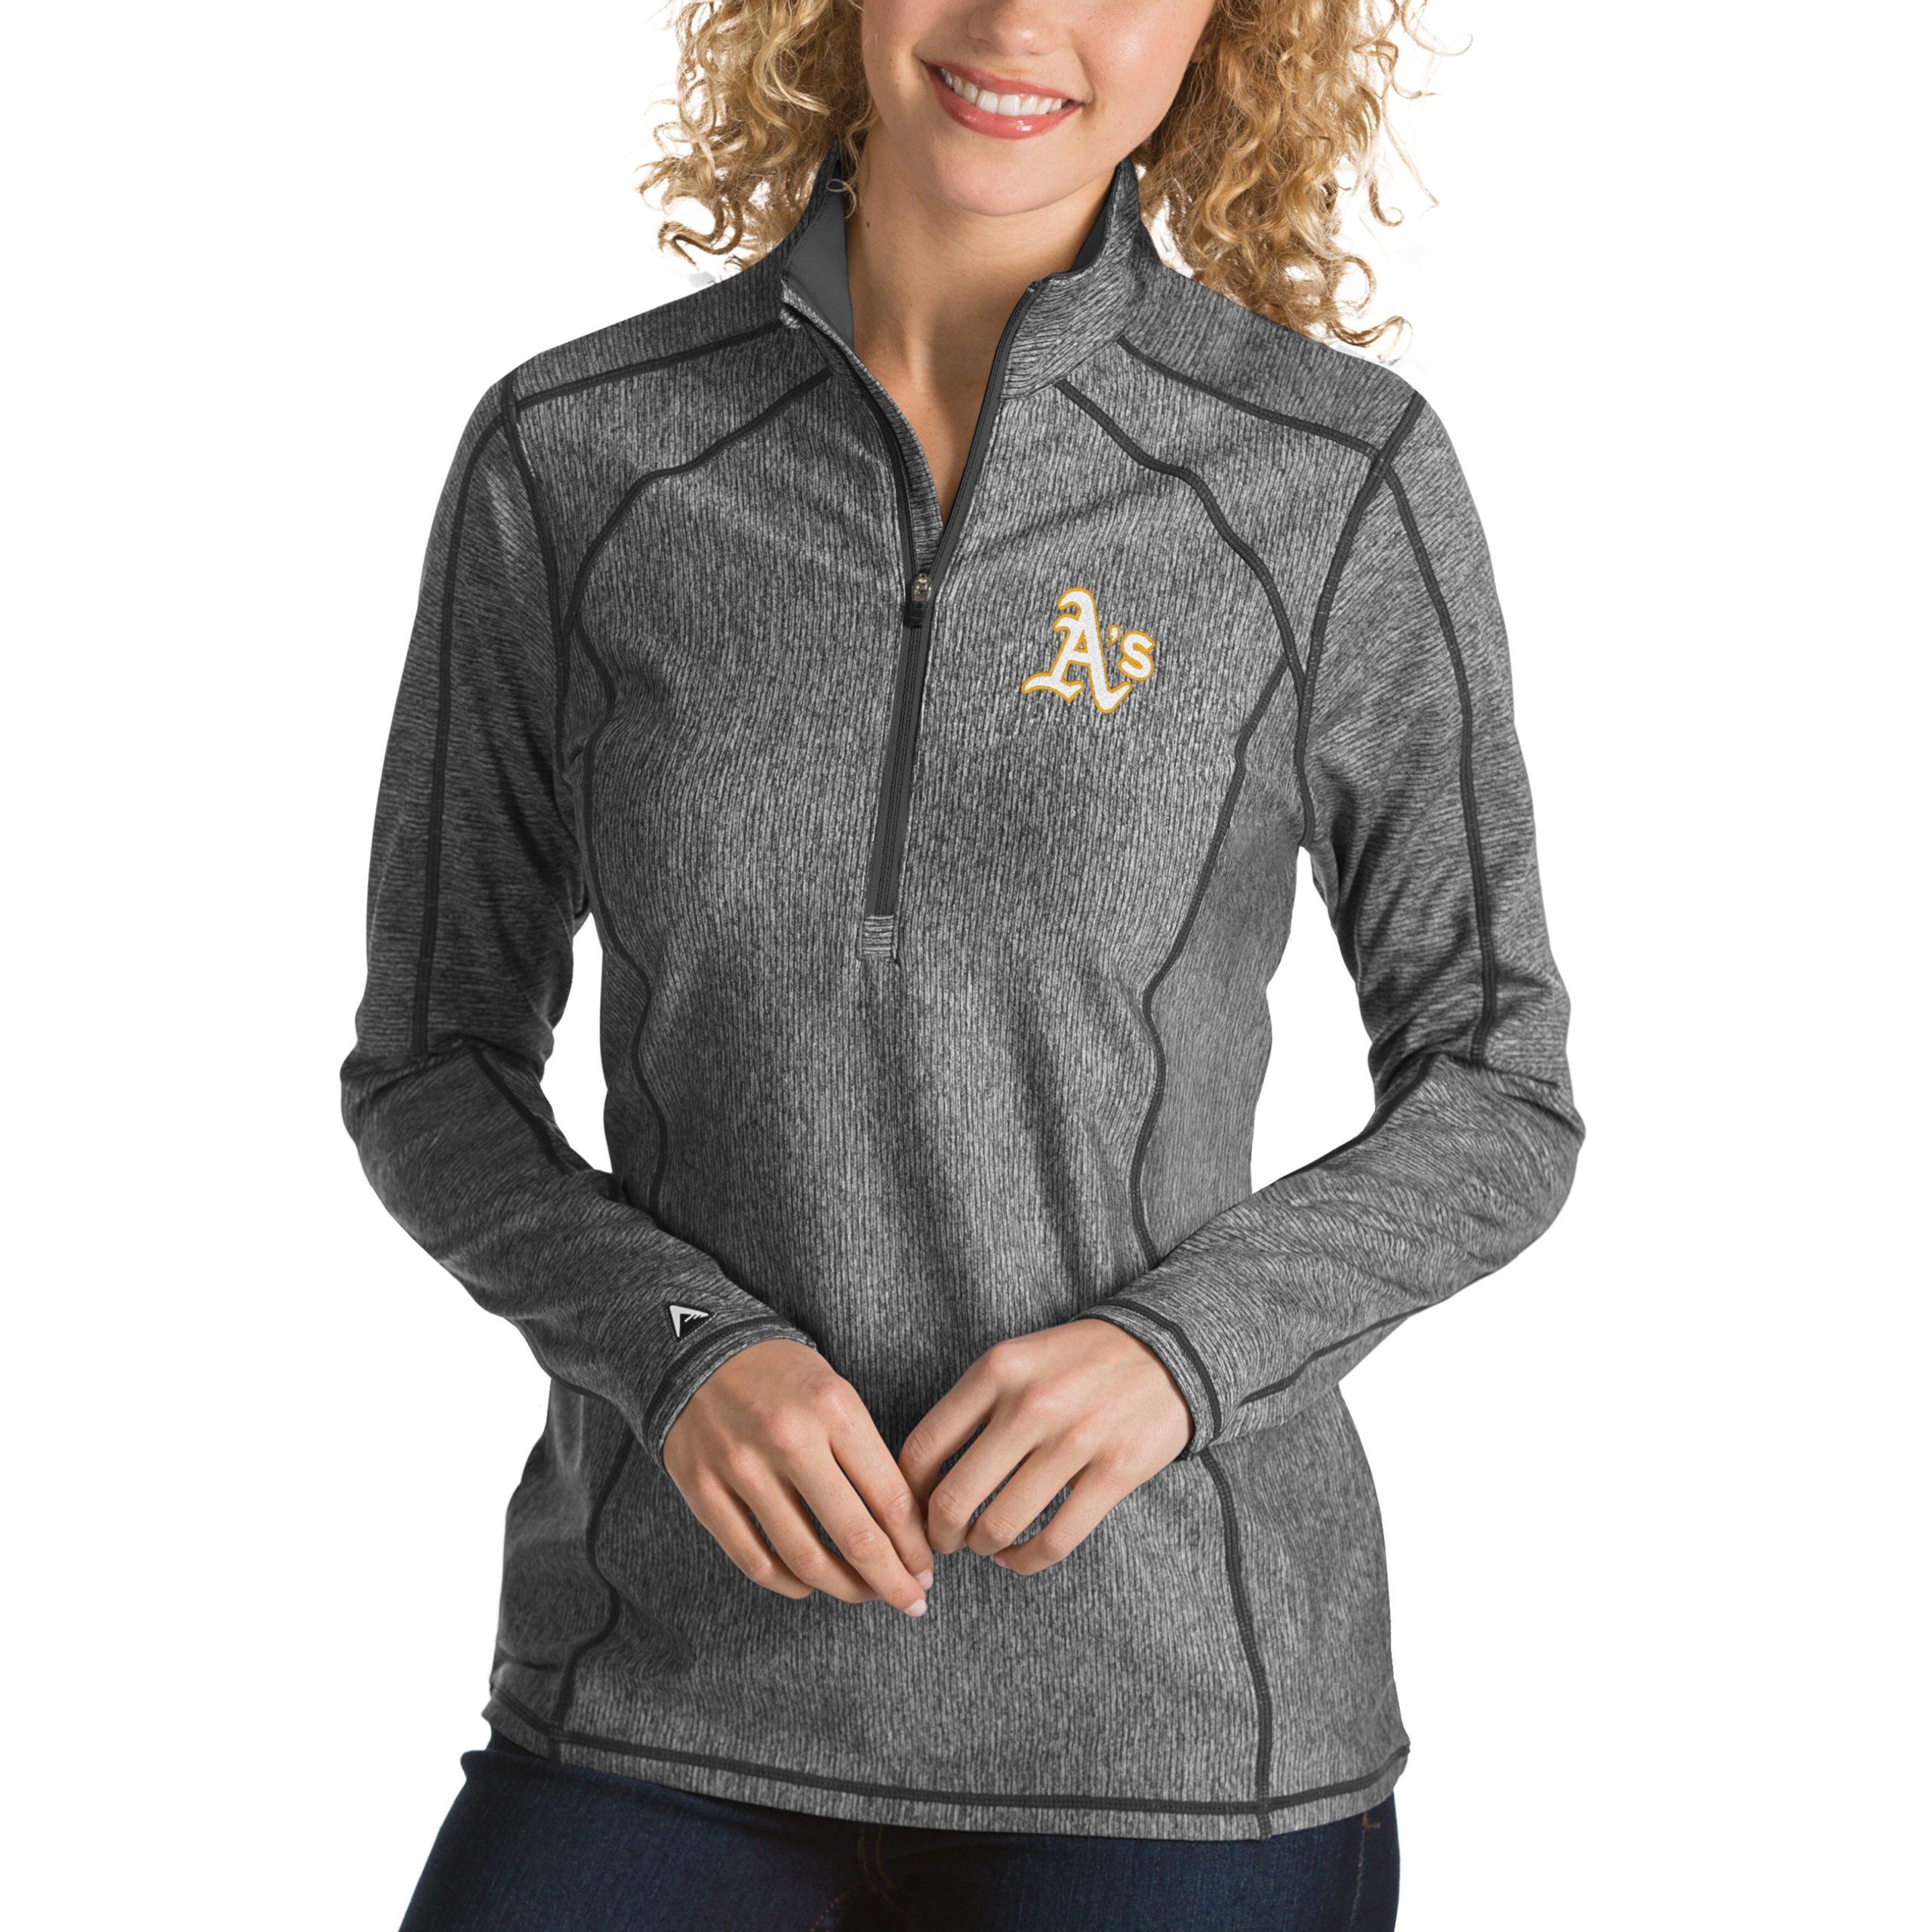 Oakland Athletics Antigua Women's Tempo Desert Dry 1/4-Zip Pullover Jacket - Heathered Charcoal